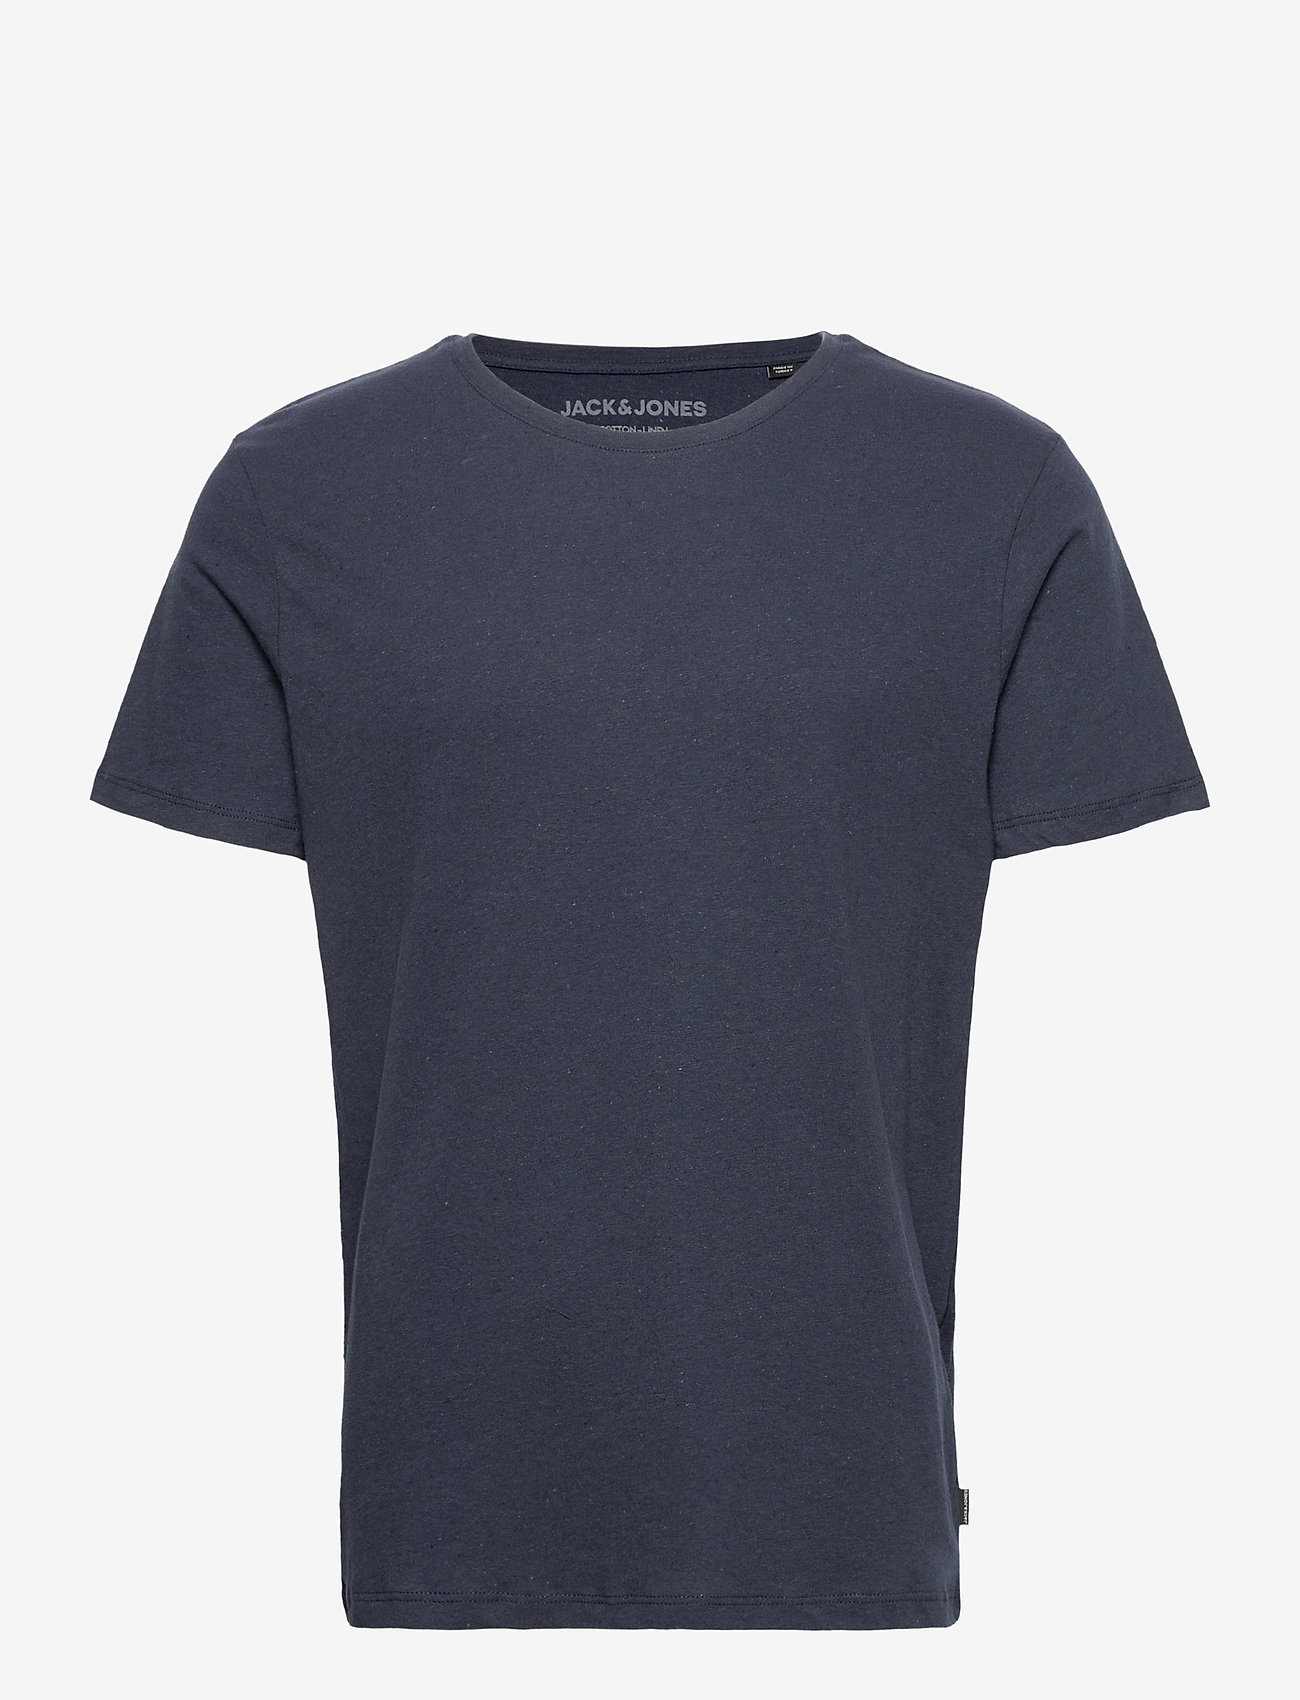 Jack & Jones - JJELINEN BASIC TEE SS CREW NECK STS - basic t-shirts - navy blazer - 0